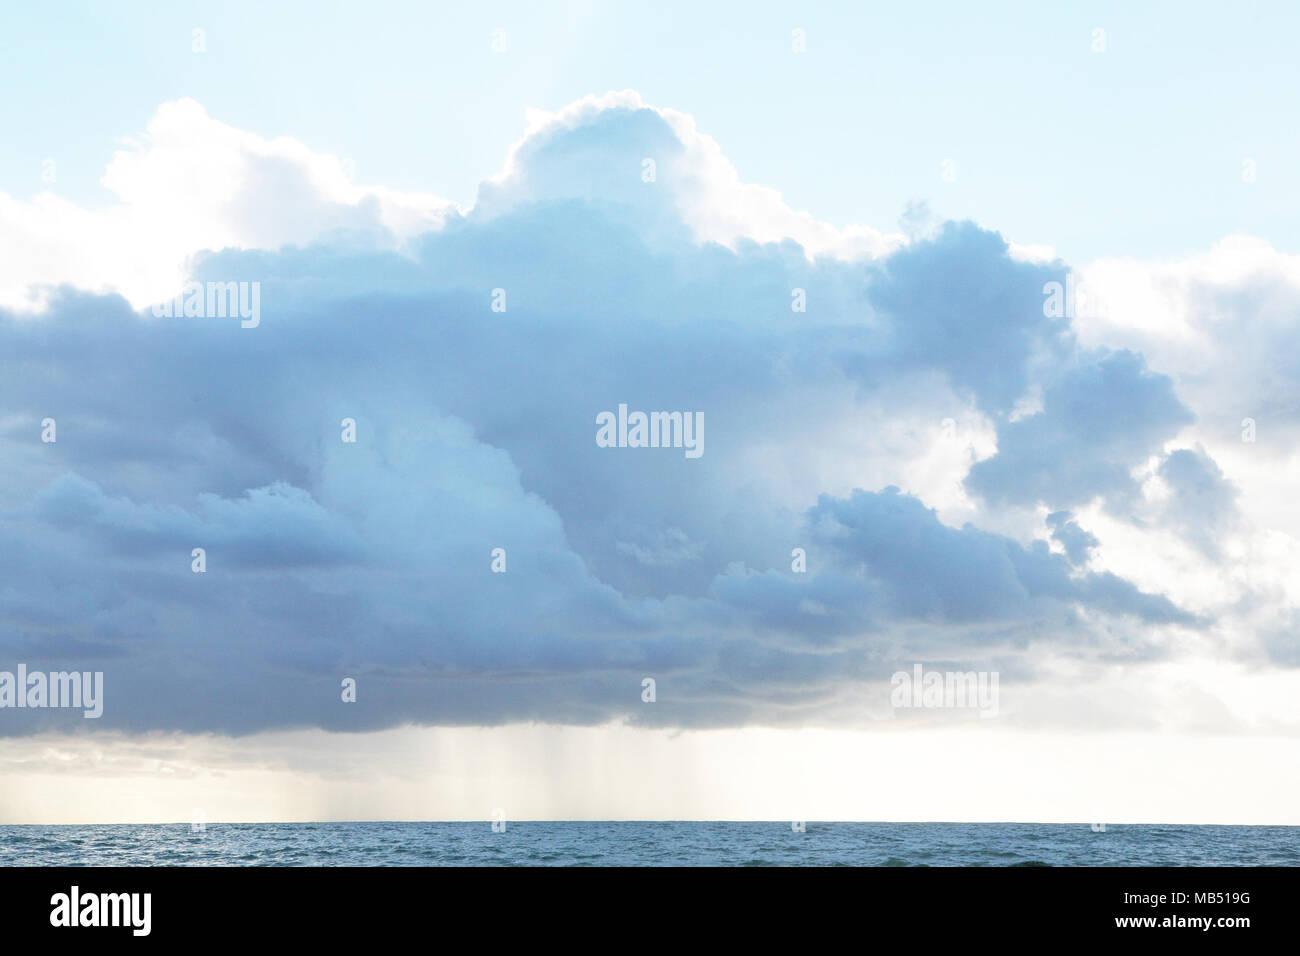 Storm rain cloud and sun over the sea - Stock Image